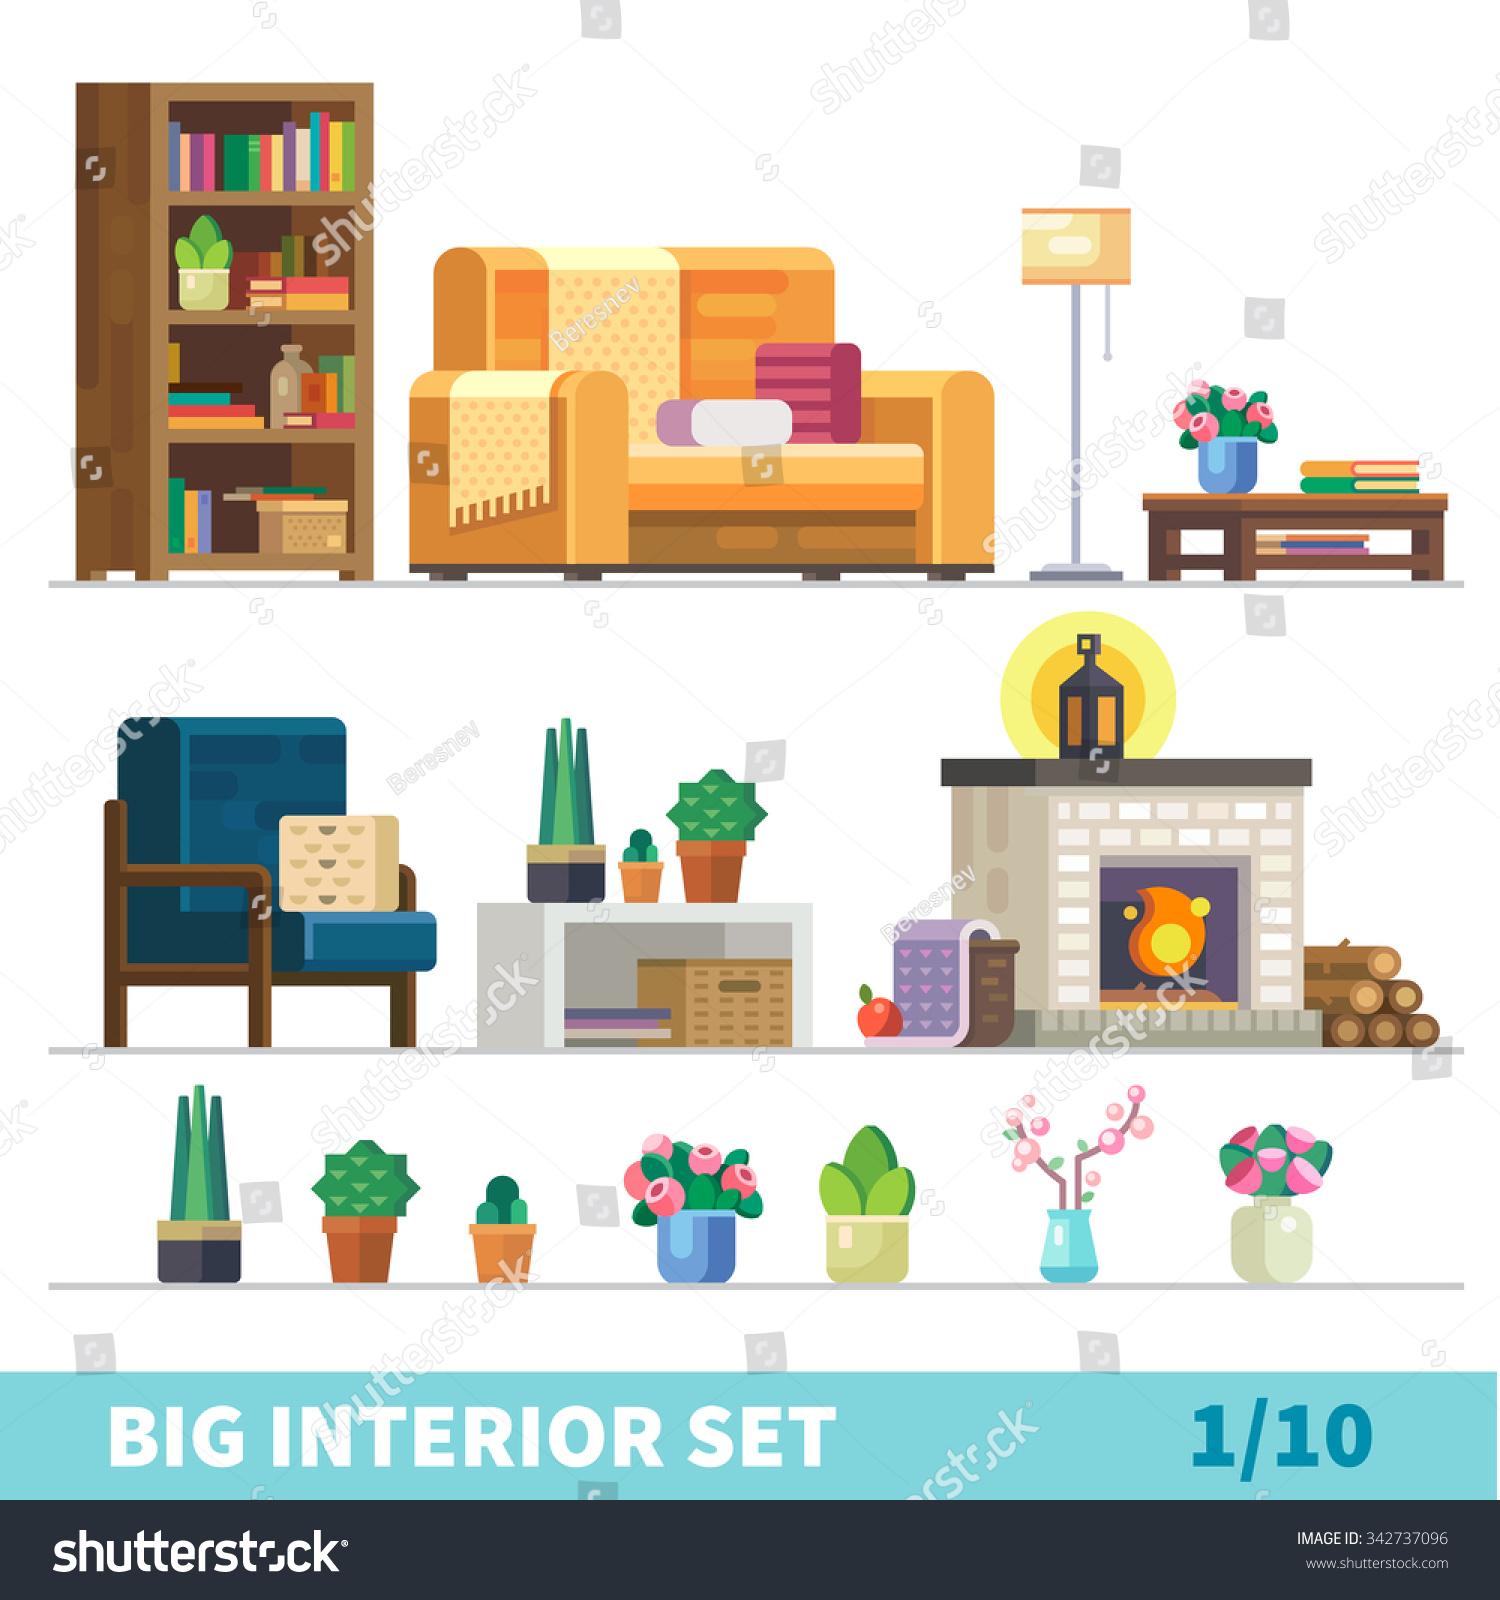 Big Cozy Living Room: Big Detailed Interior Set. Cozy Living Room: Nice Couch